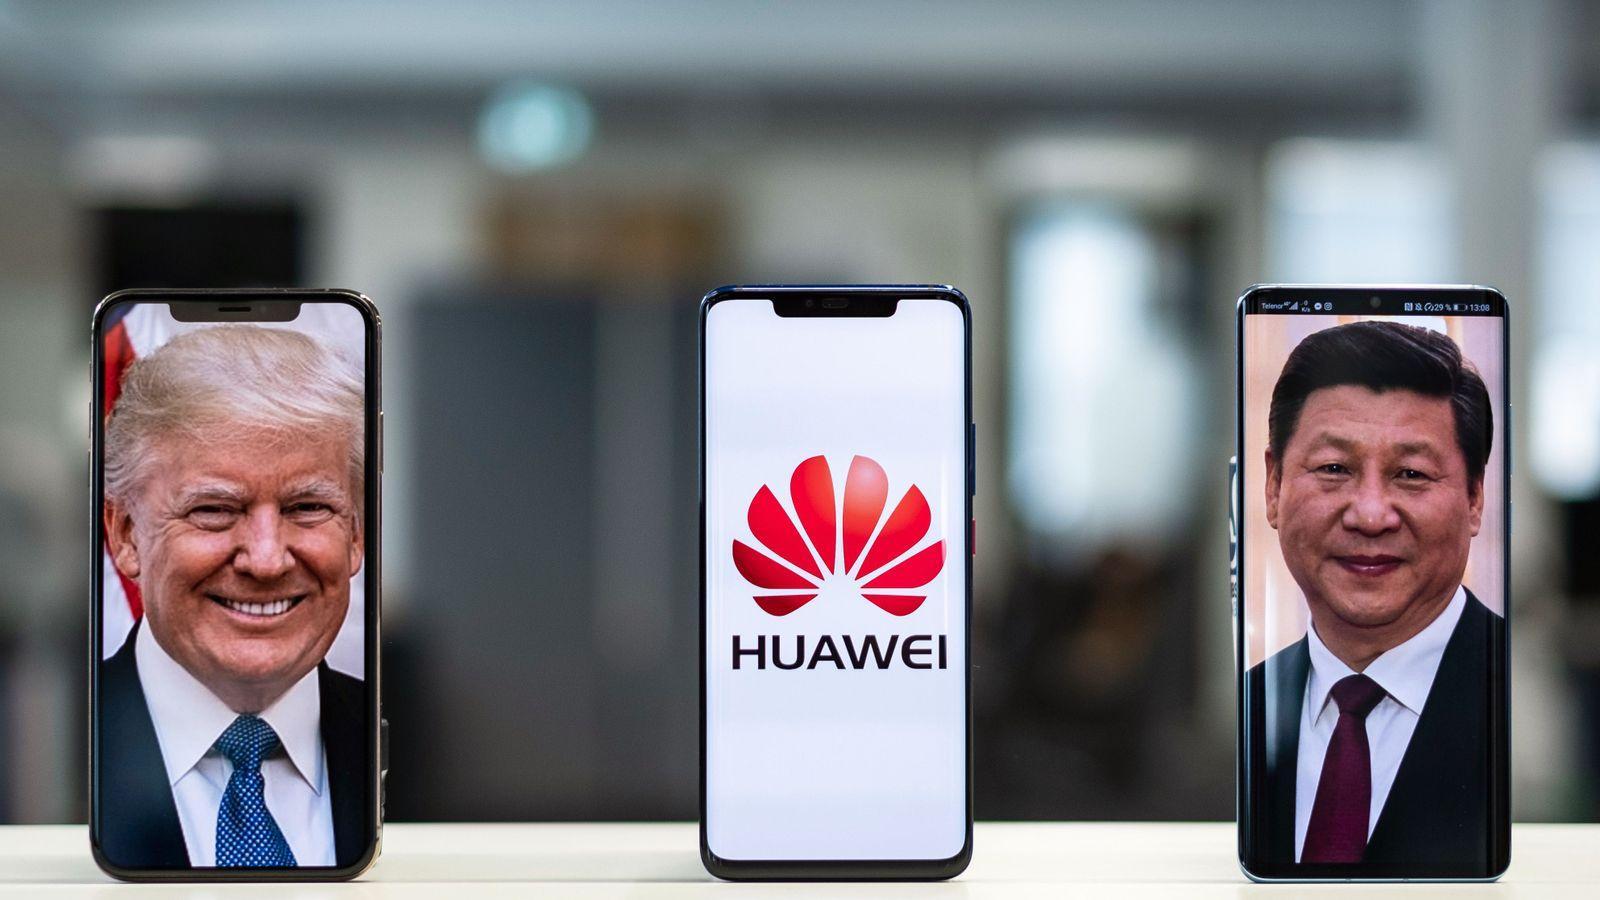 Nå svartelistes Huawei igjen